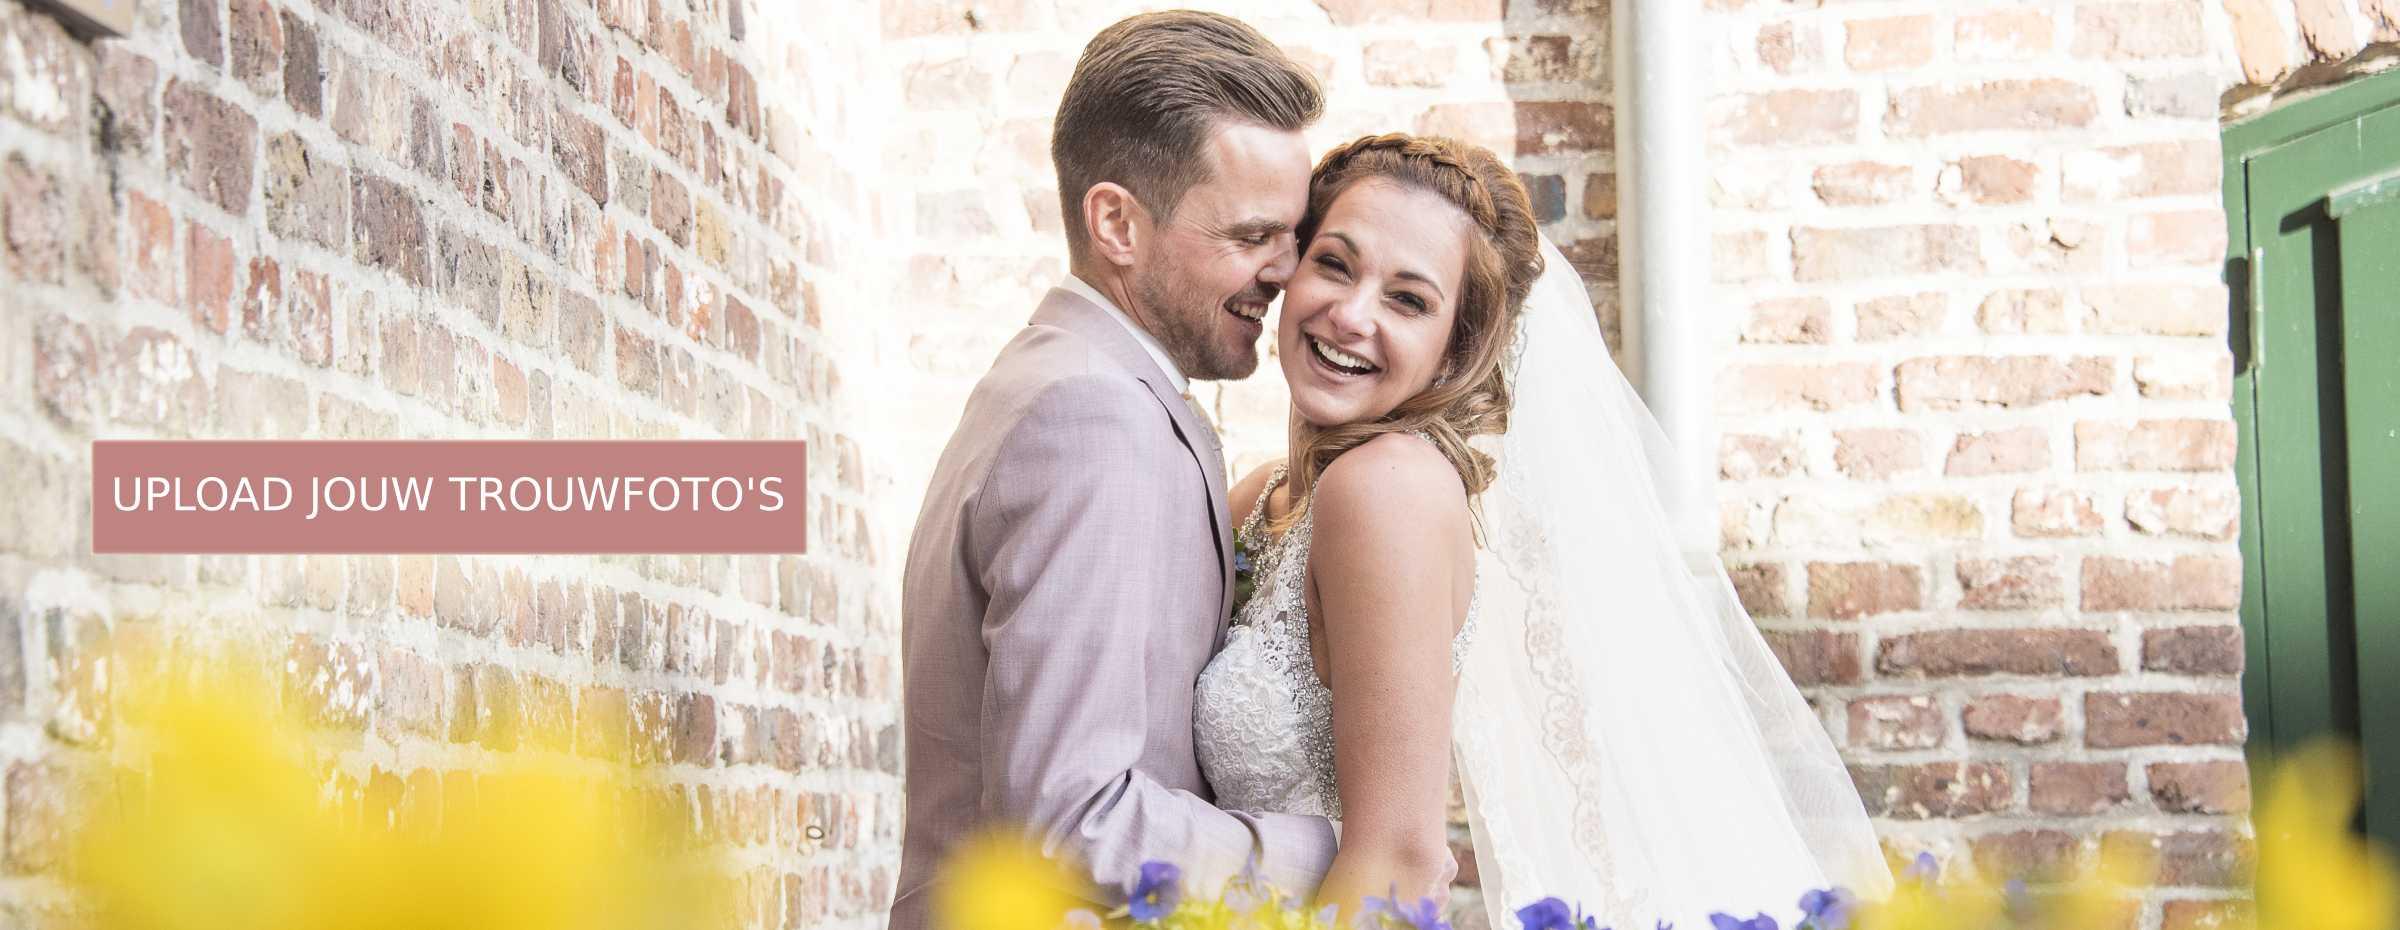 mariage bruiden, bruid, bruidje, bruidegom, trouwen, huwelijk, bruidswinkel, bruidsmode